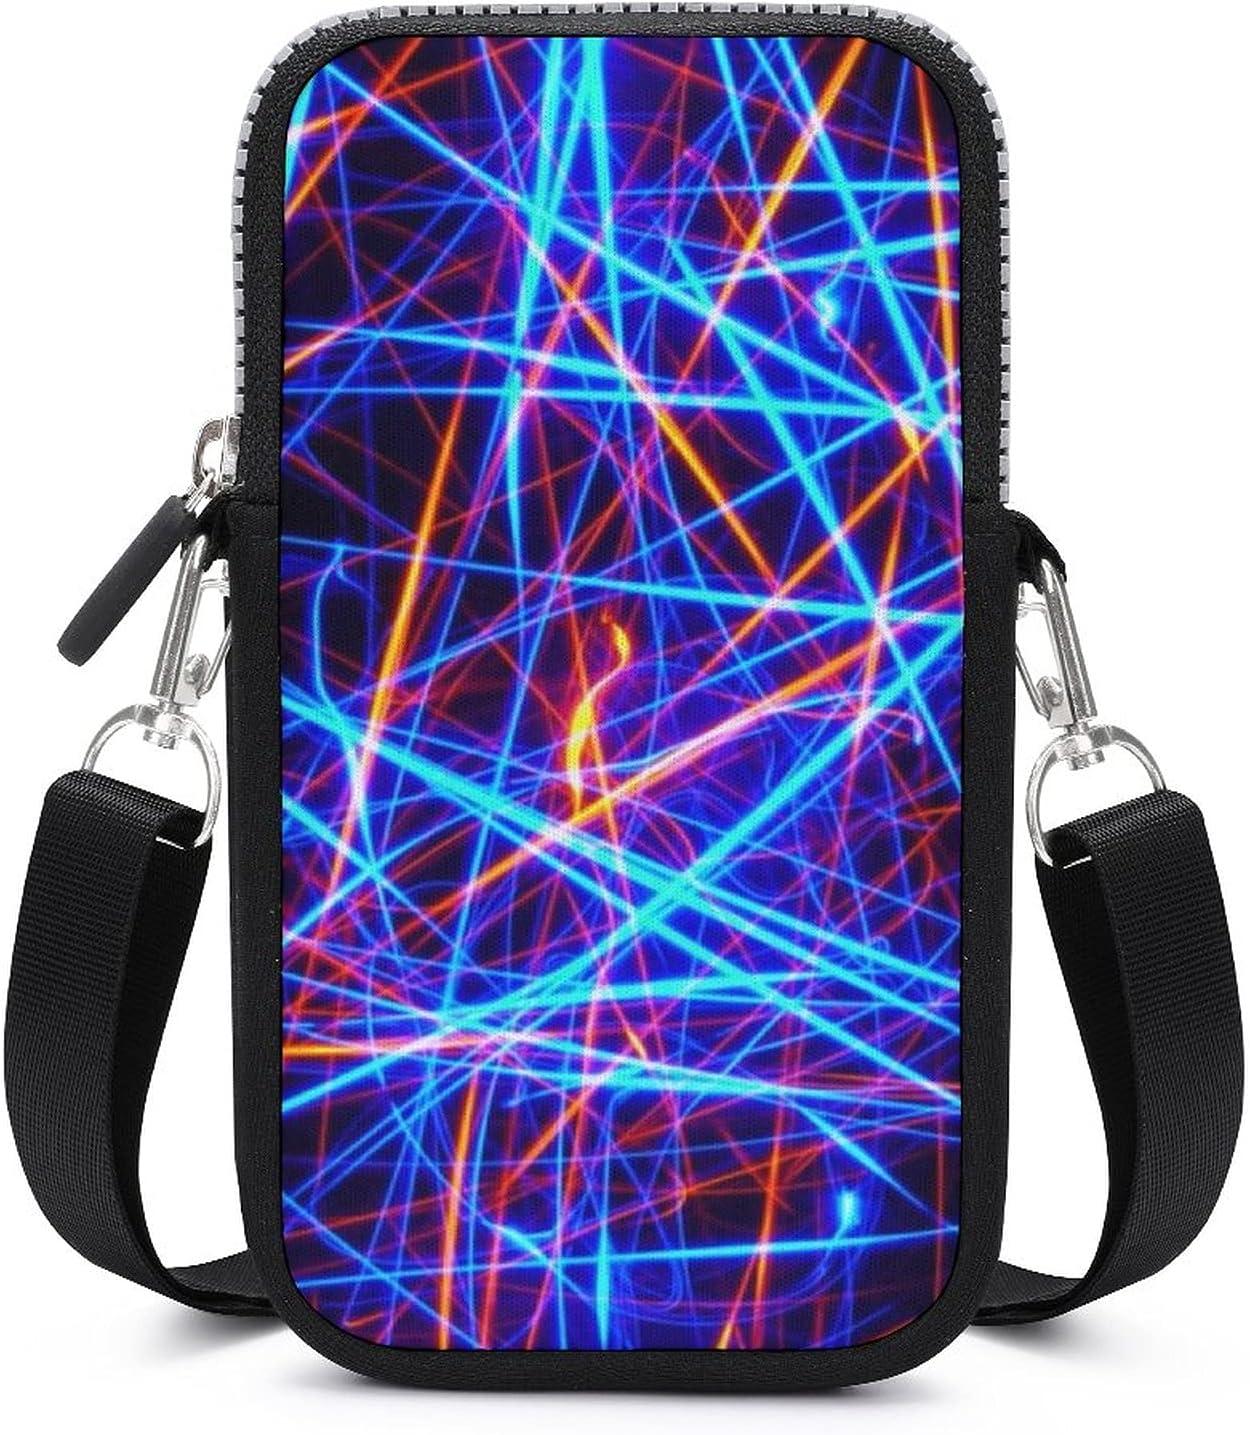 SWEET TANG Neon Lights Phone Riding Multipurpose Handbag - Passport, Credit Card Adjustable Shoulder Strap, Holder Wristlet Convertible Cross Body Bag